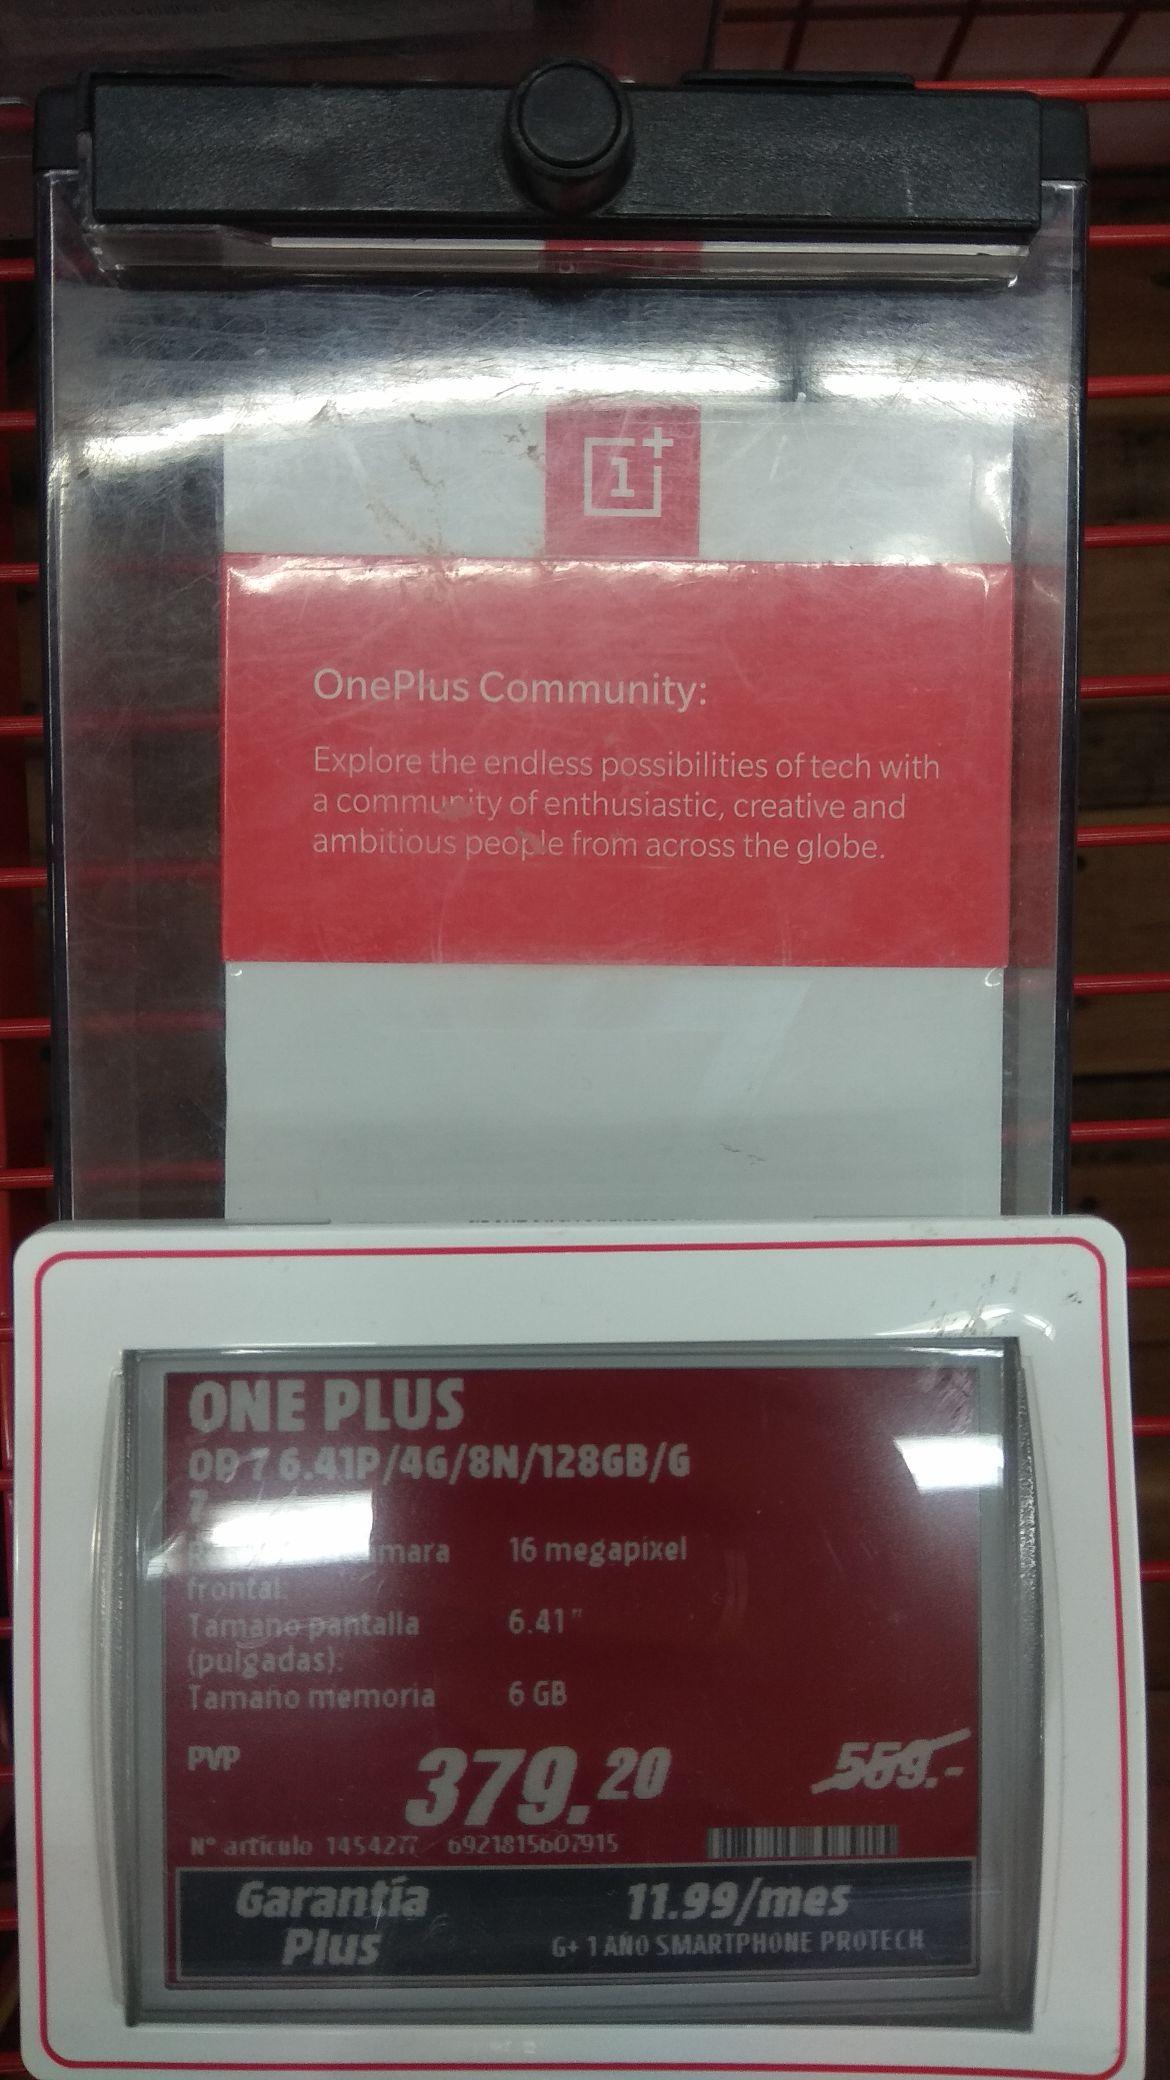 Oneplus 7 6GB/128GB